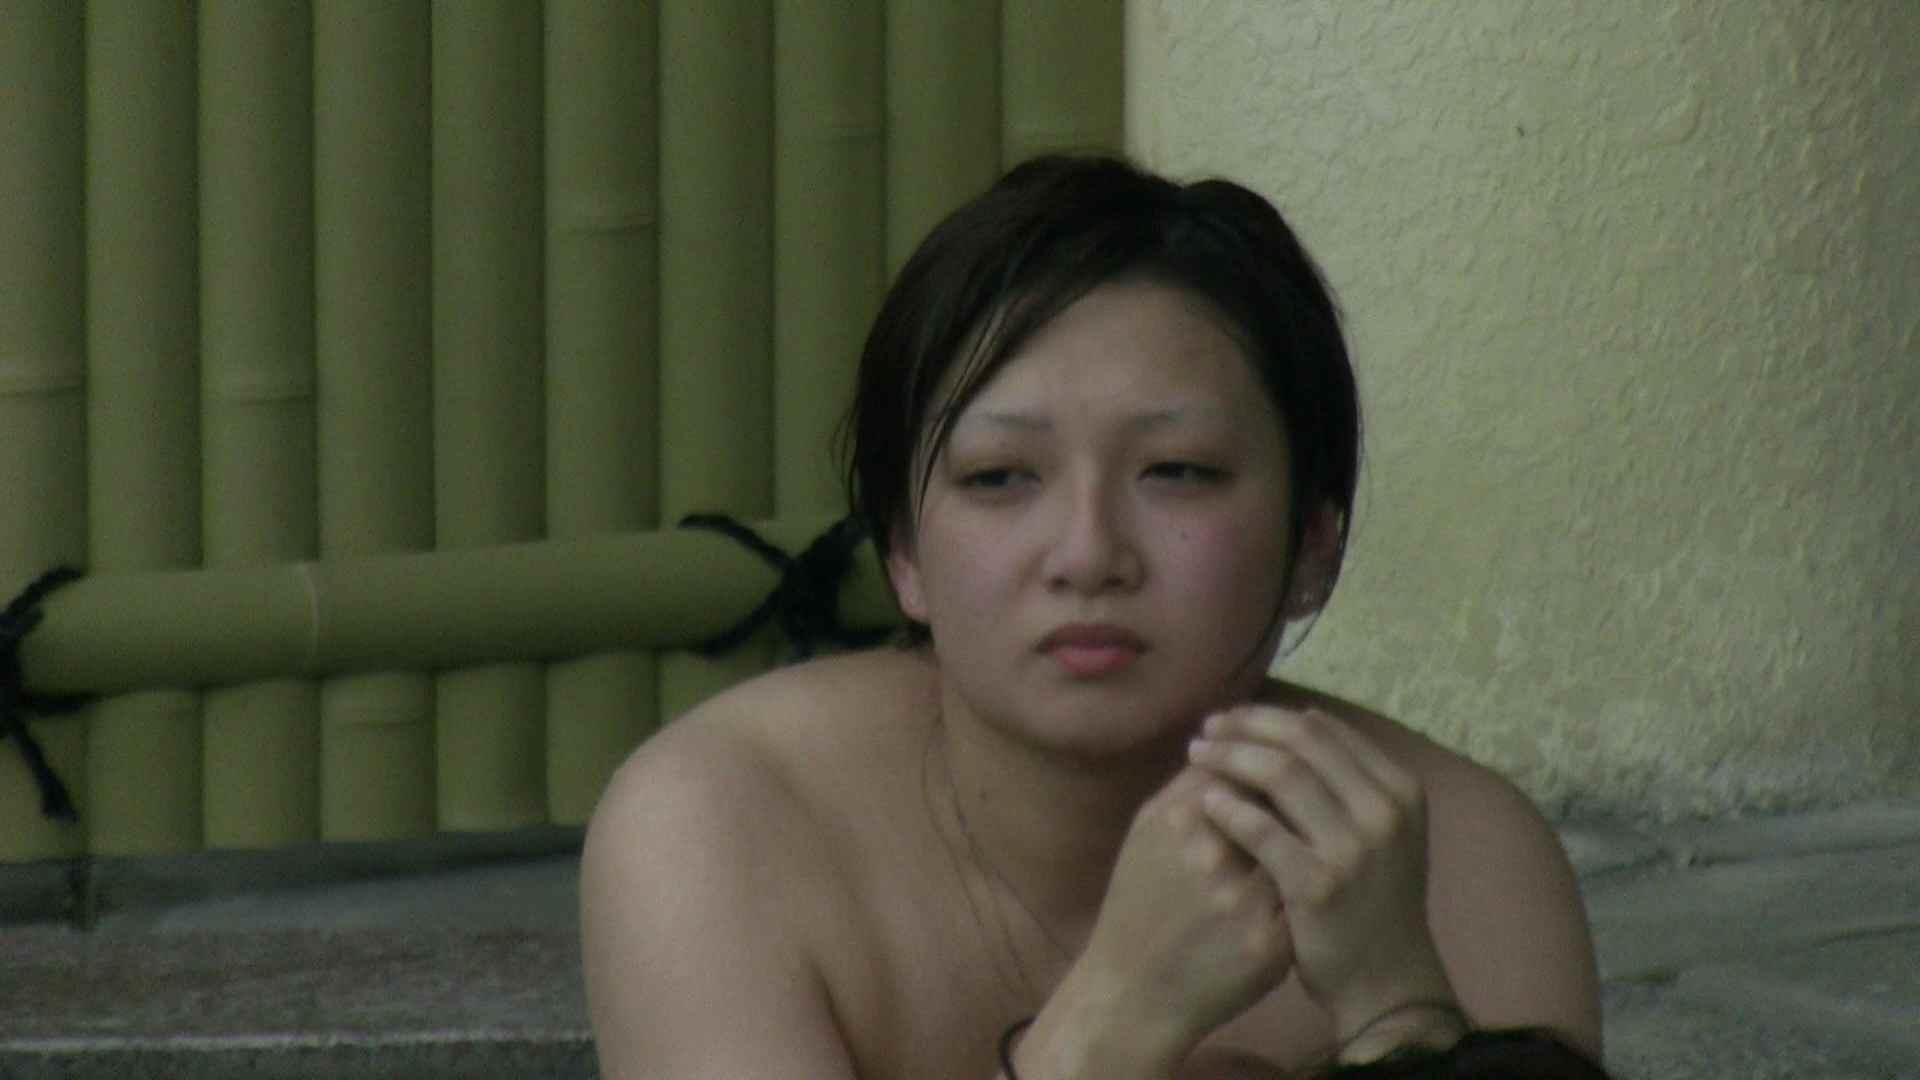 Aquaな露天風呂Vol.184 露天 | 盗撮特撮  13pic 7